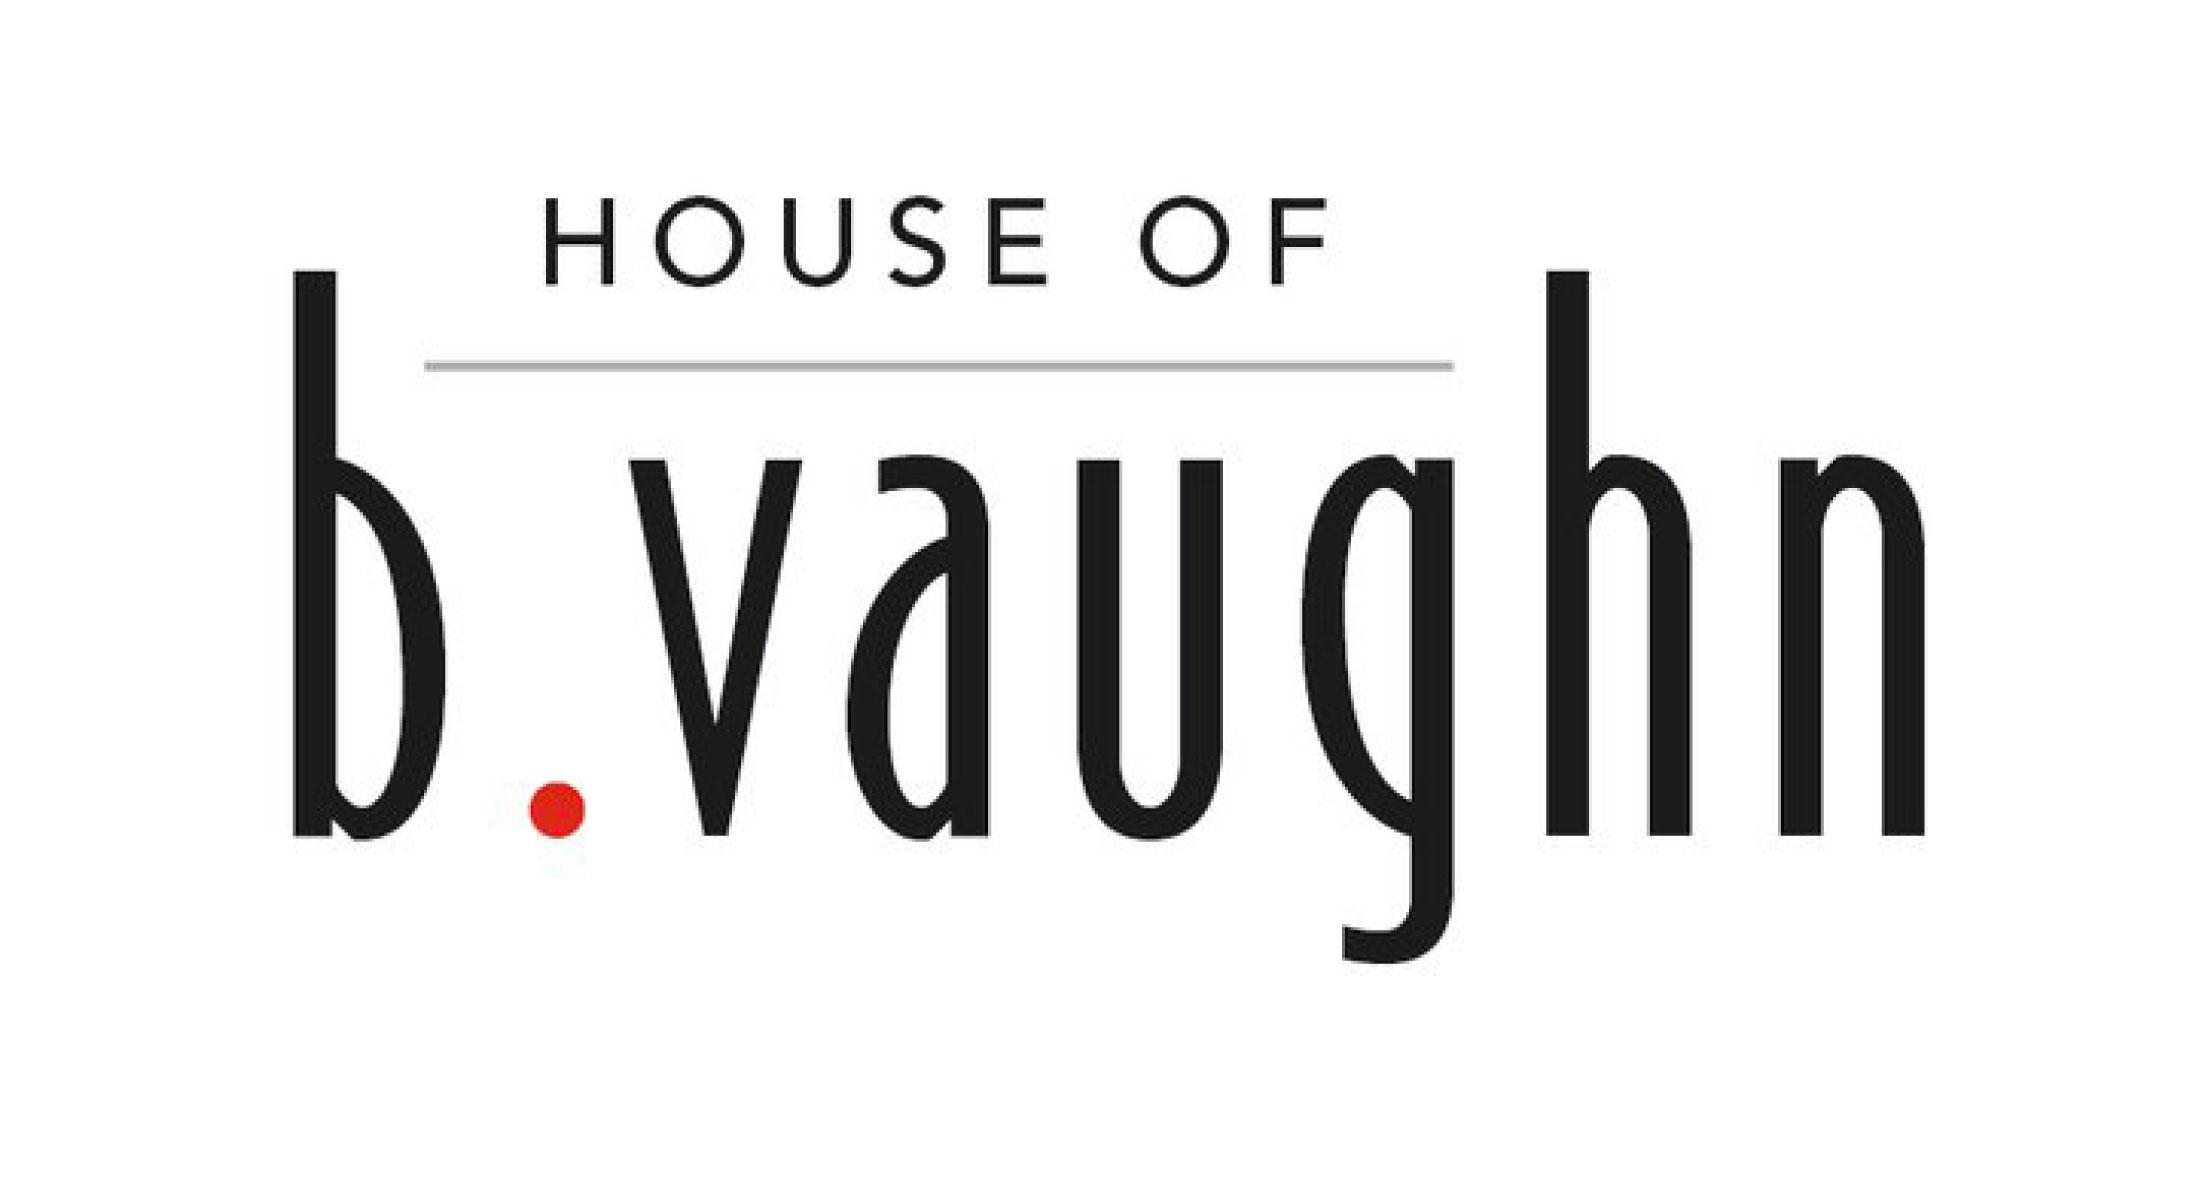 House of B. Vaughn